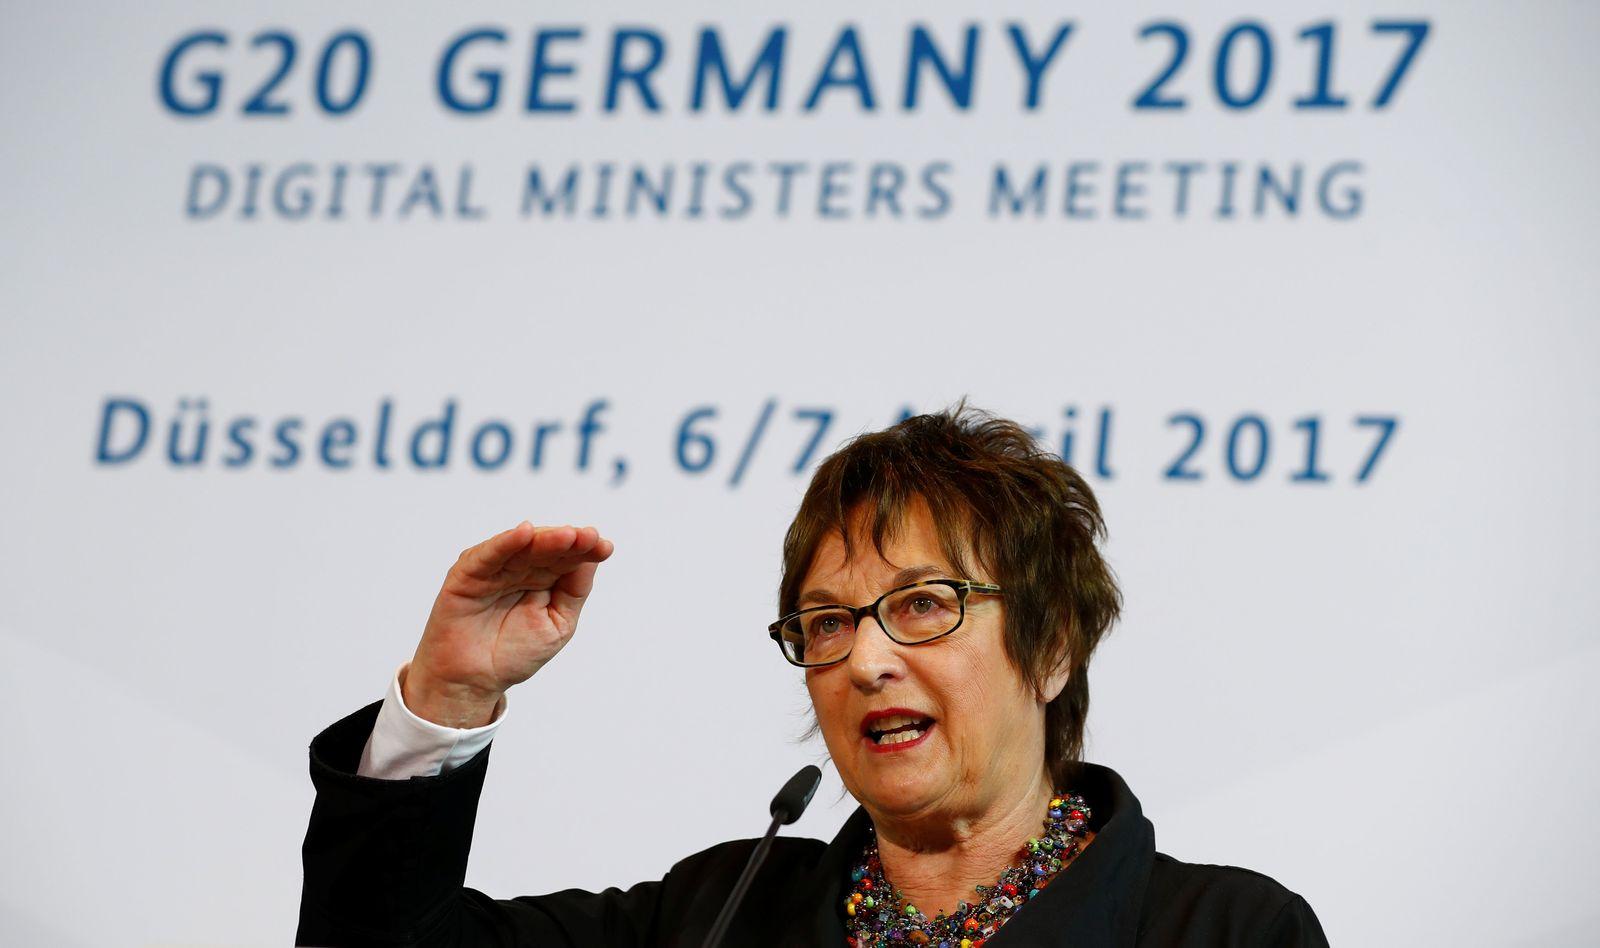 G20 / Brigitte Zypries